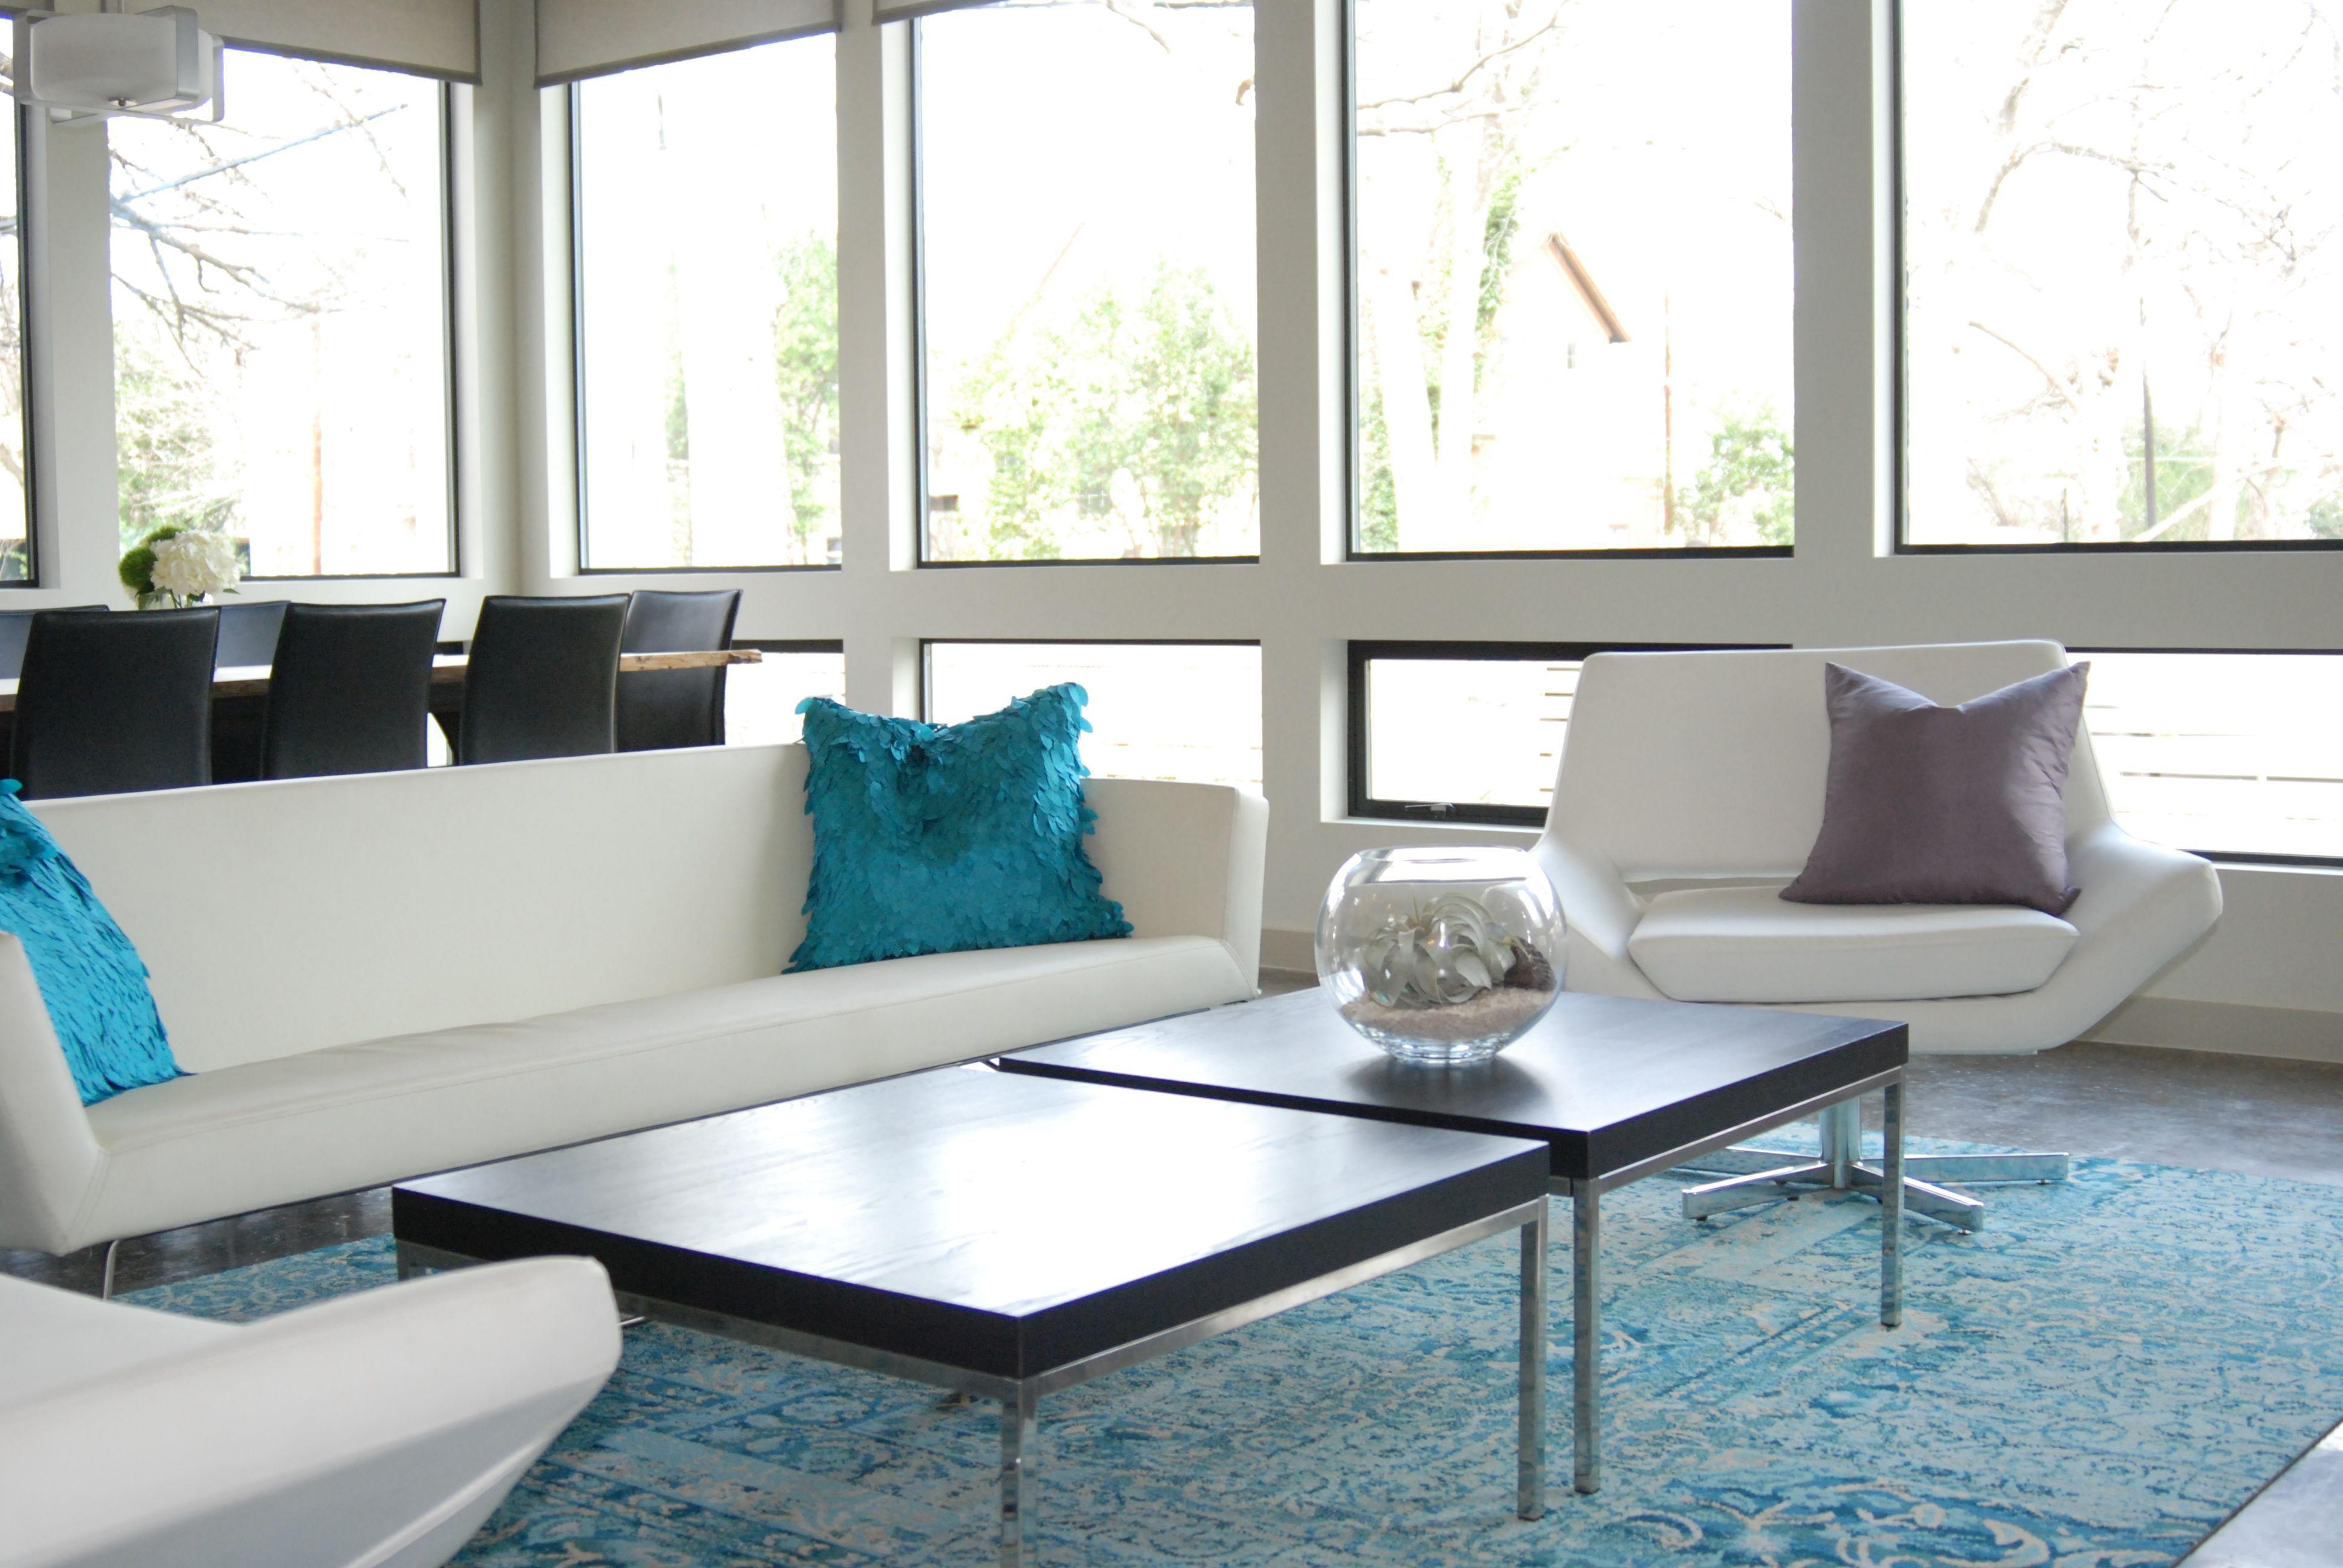 contemporary living room | Home Tours #Austin | Pinterest | Living ...